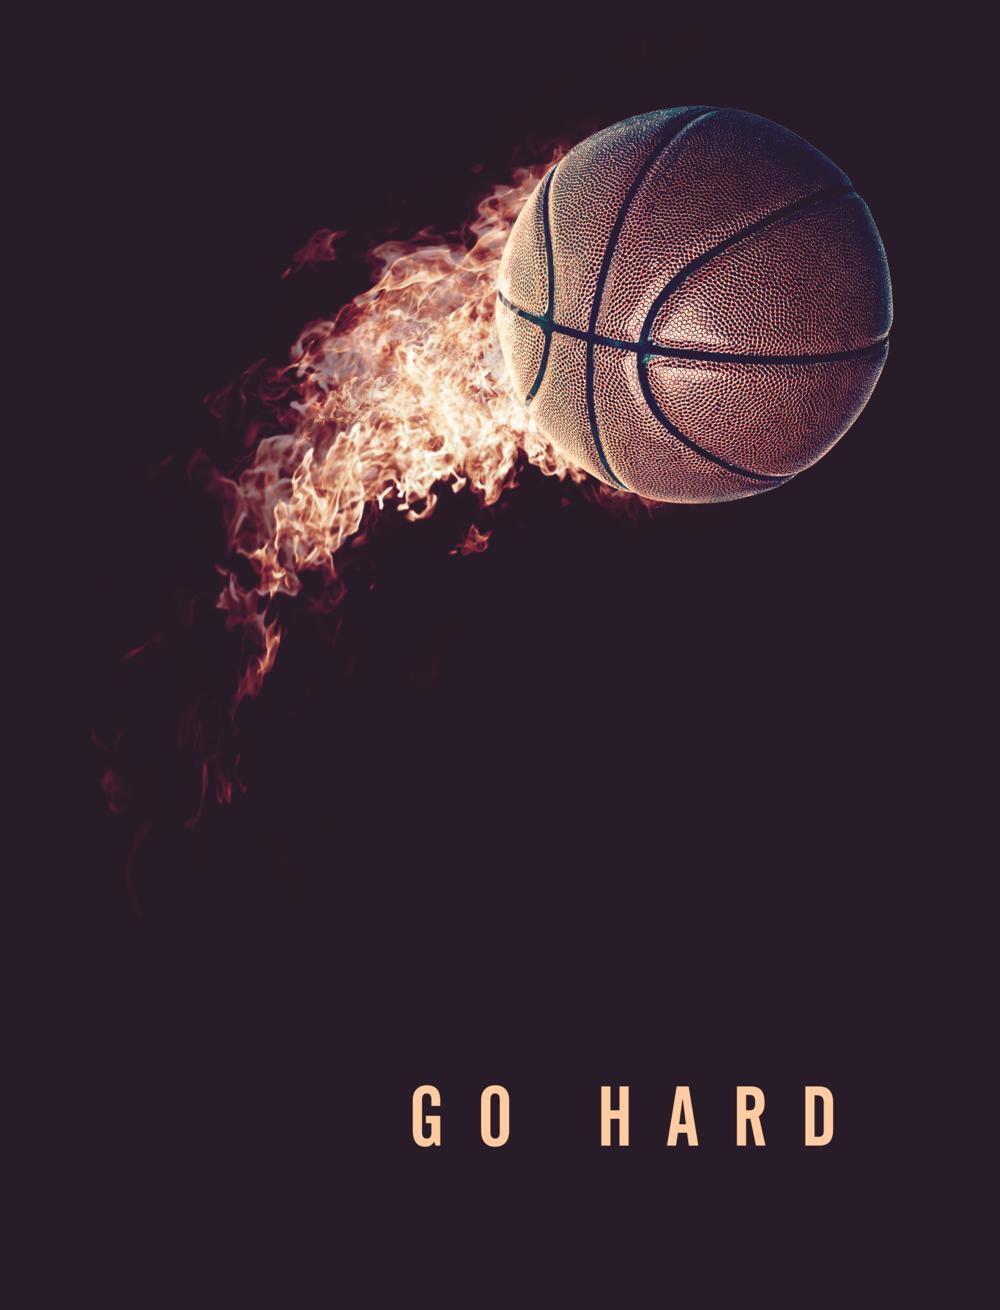 Basketball Poster Design by Noah Camp